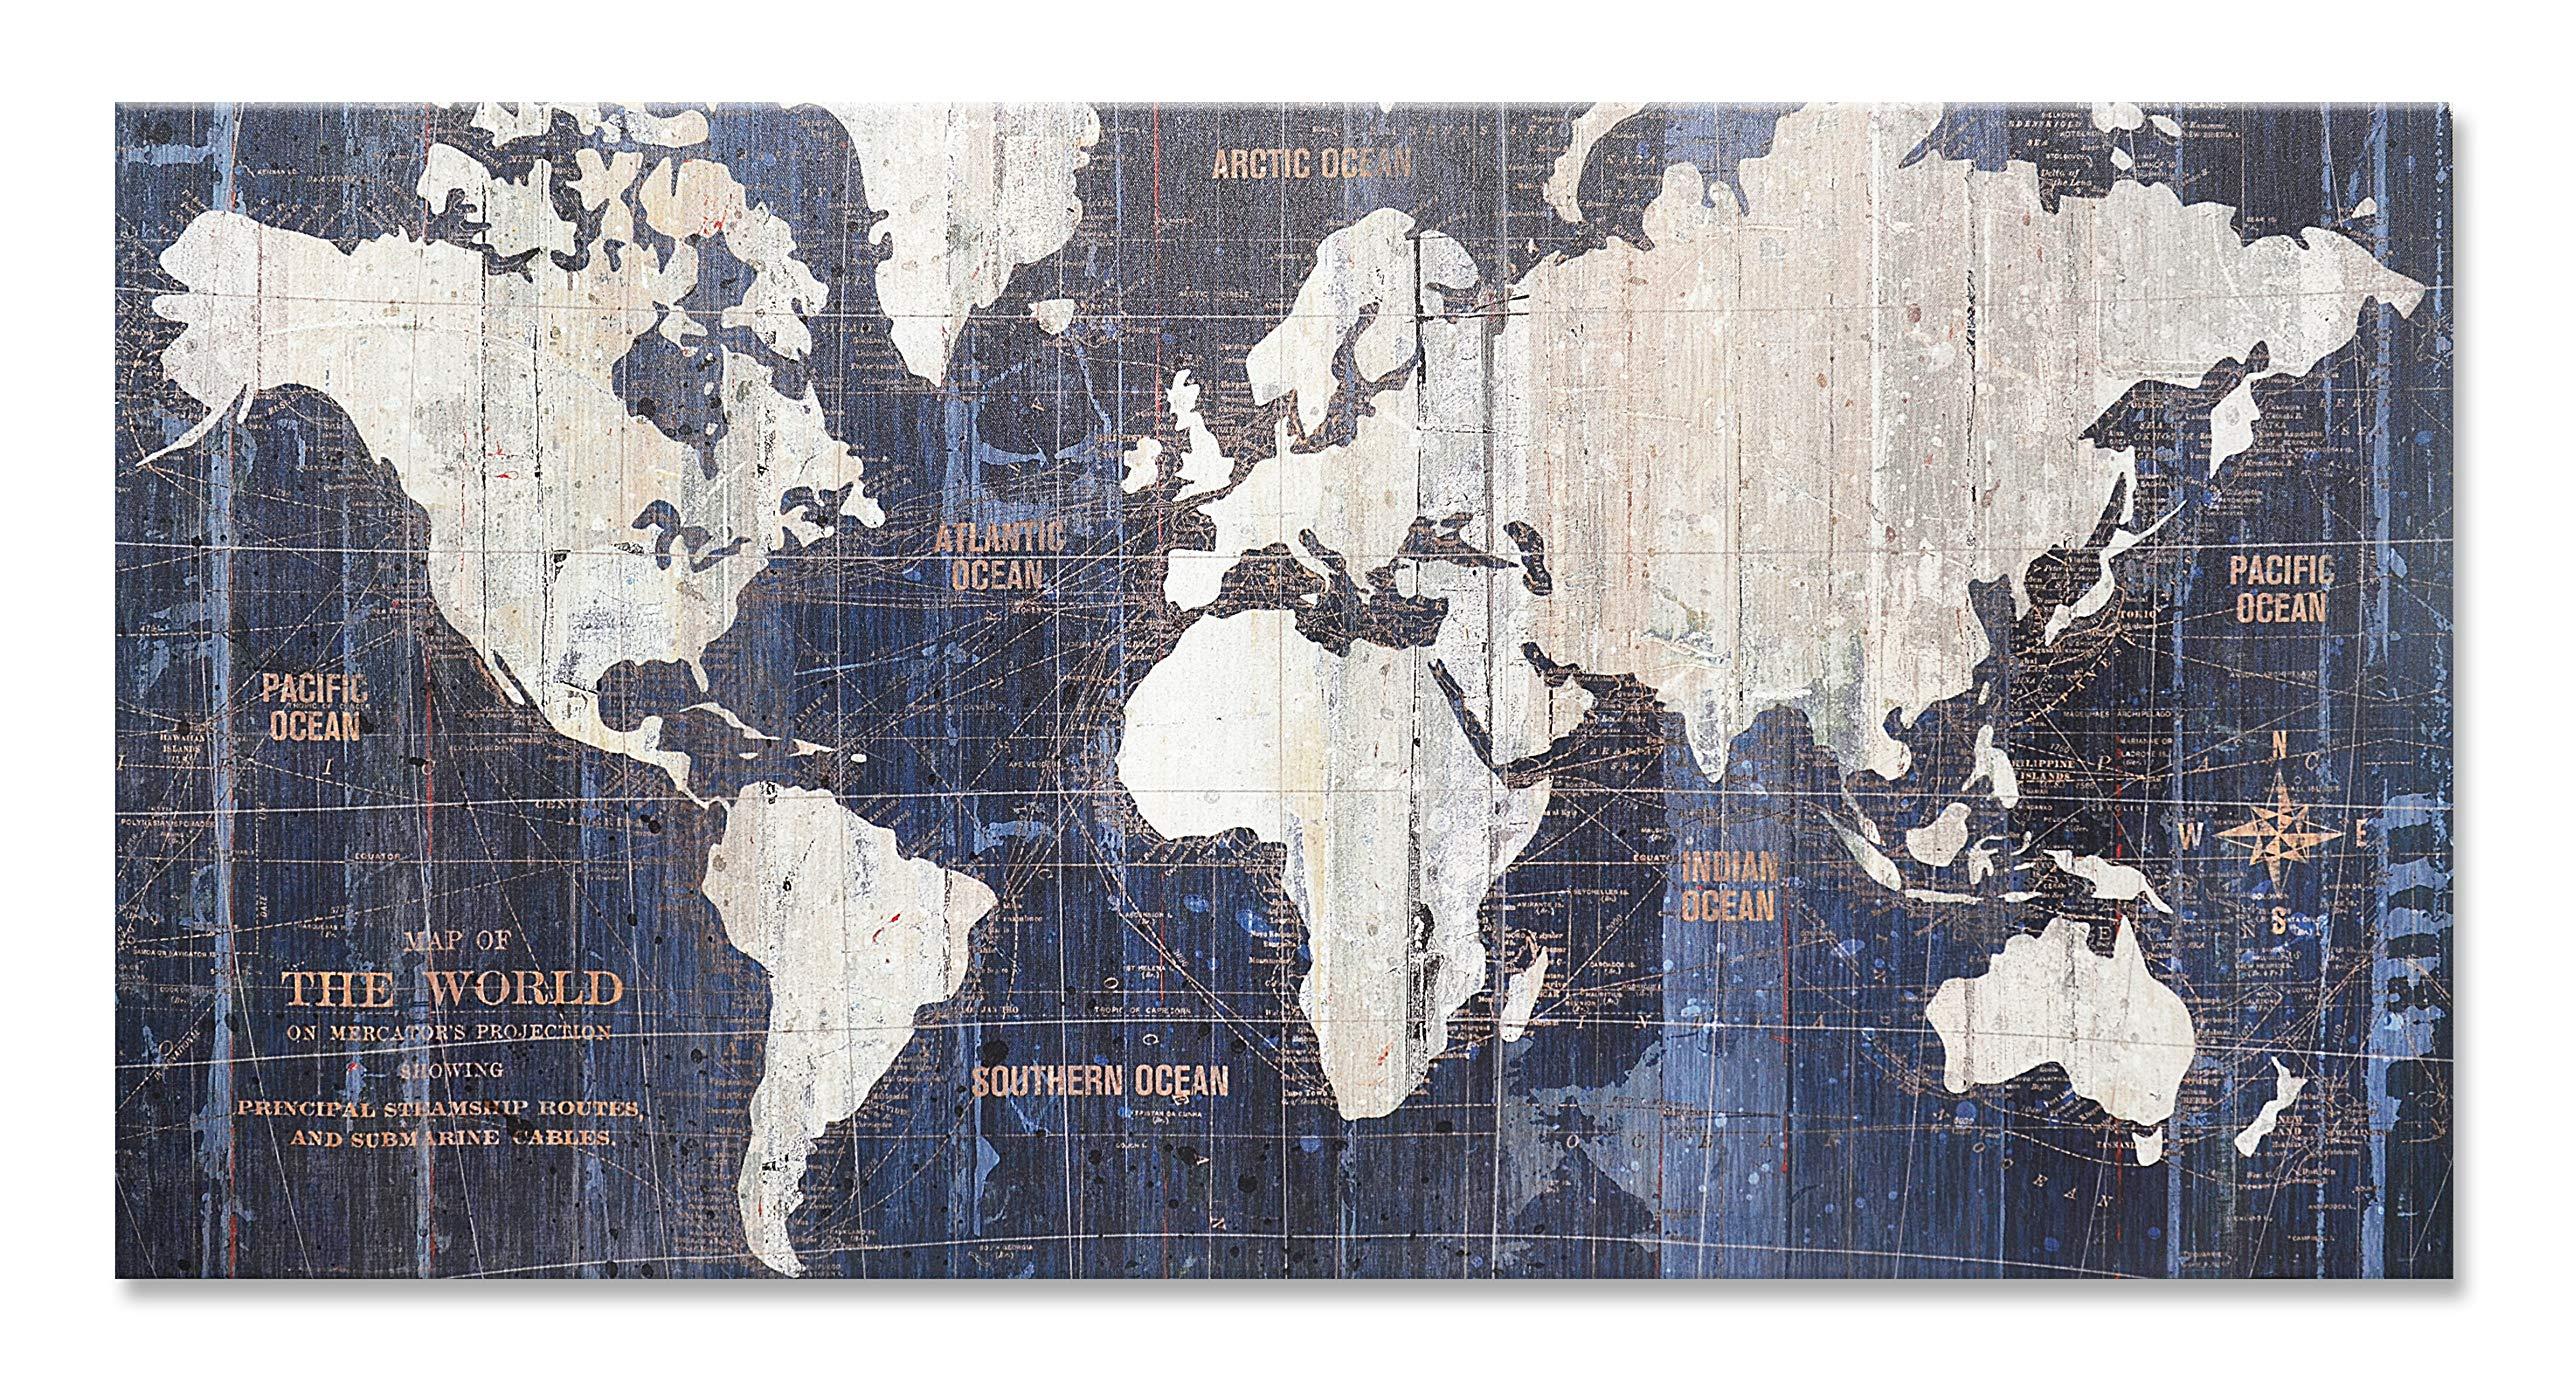 Homekor Old World Map - Travel Map Wall Art Canvas 40 x 20